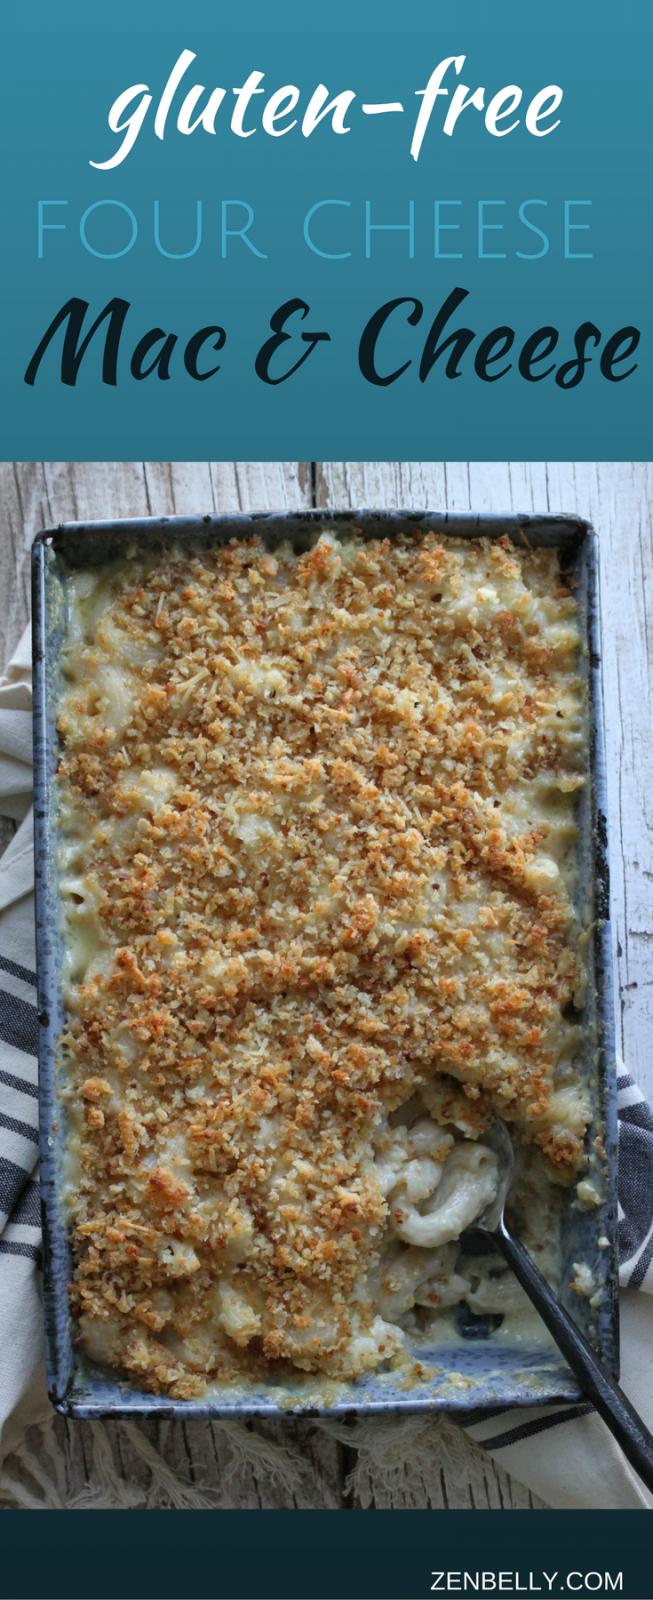 GLUTENFREE mac 7 cheese